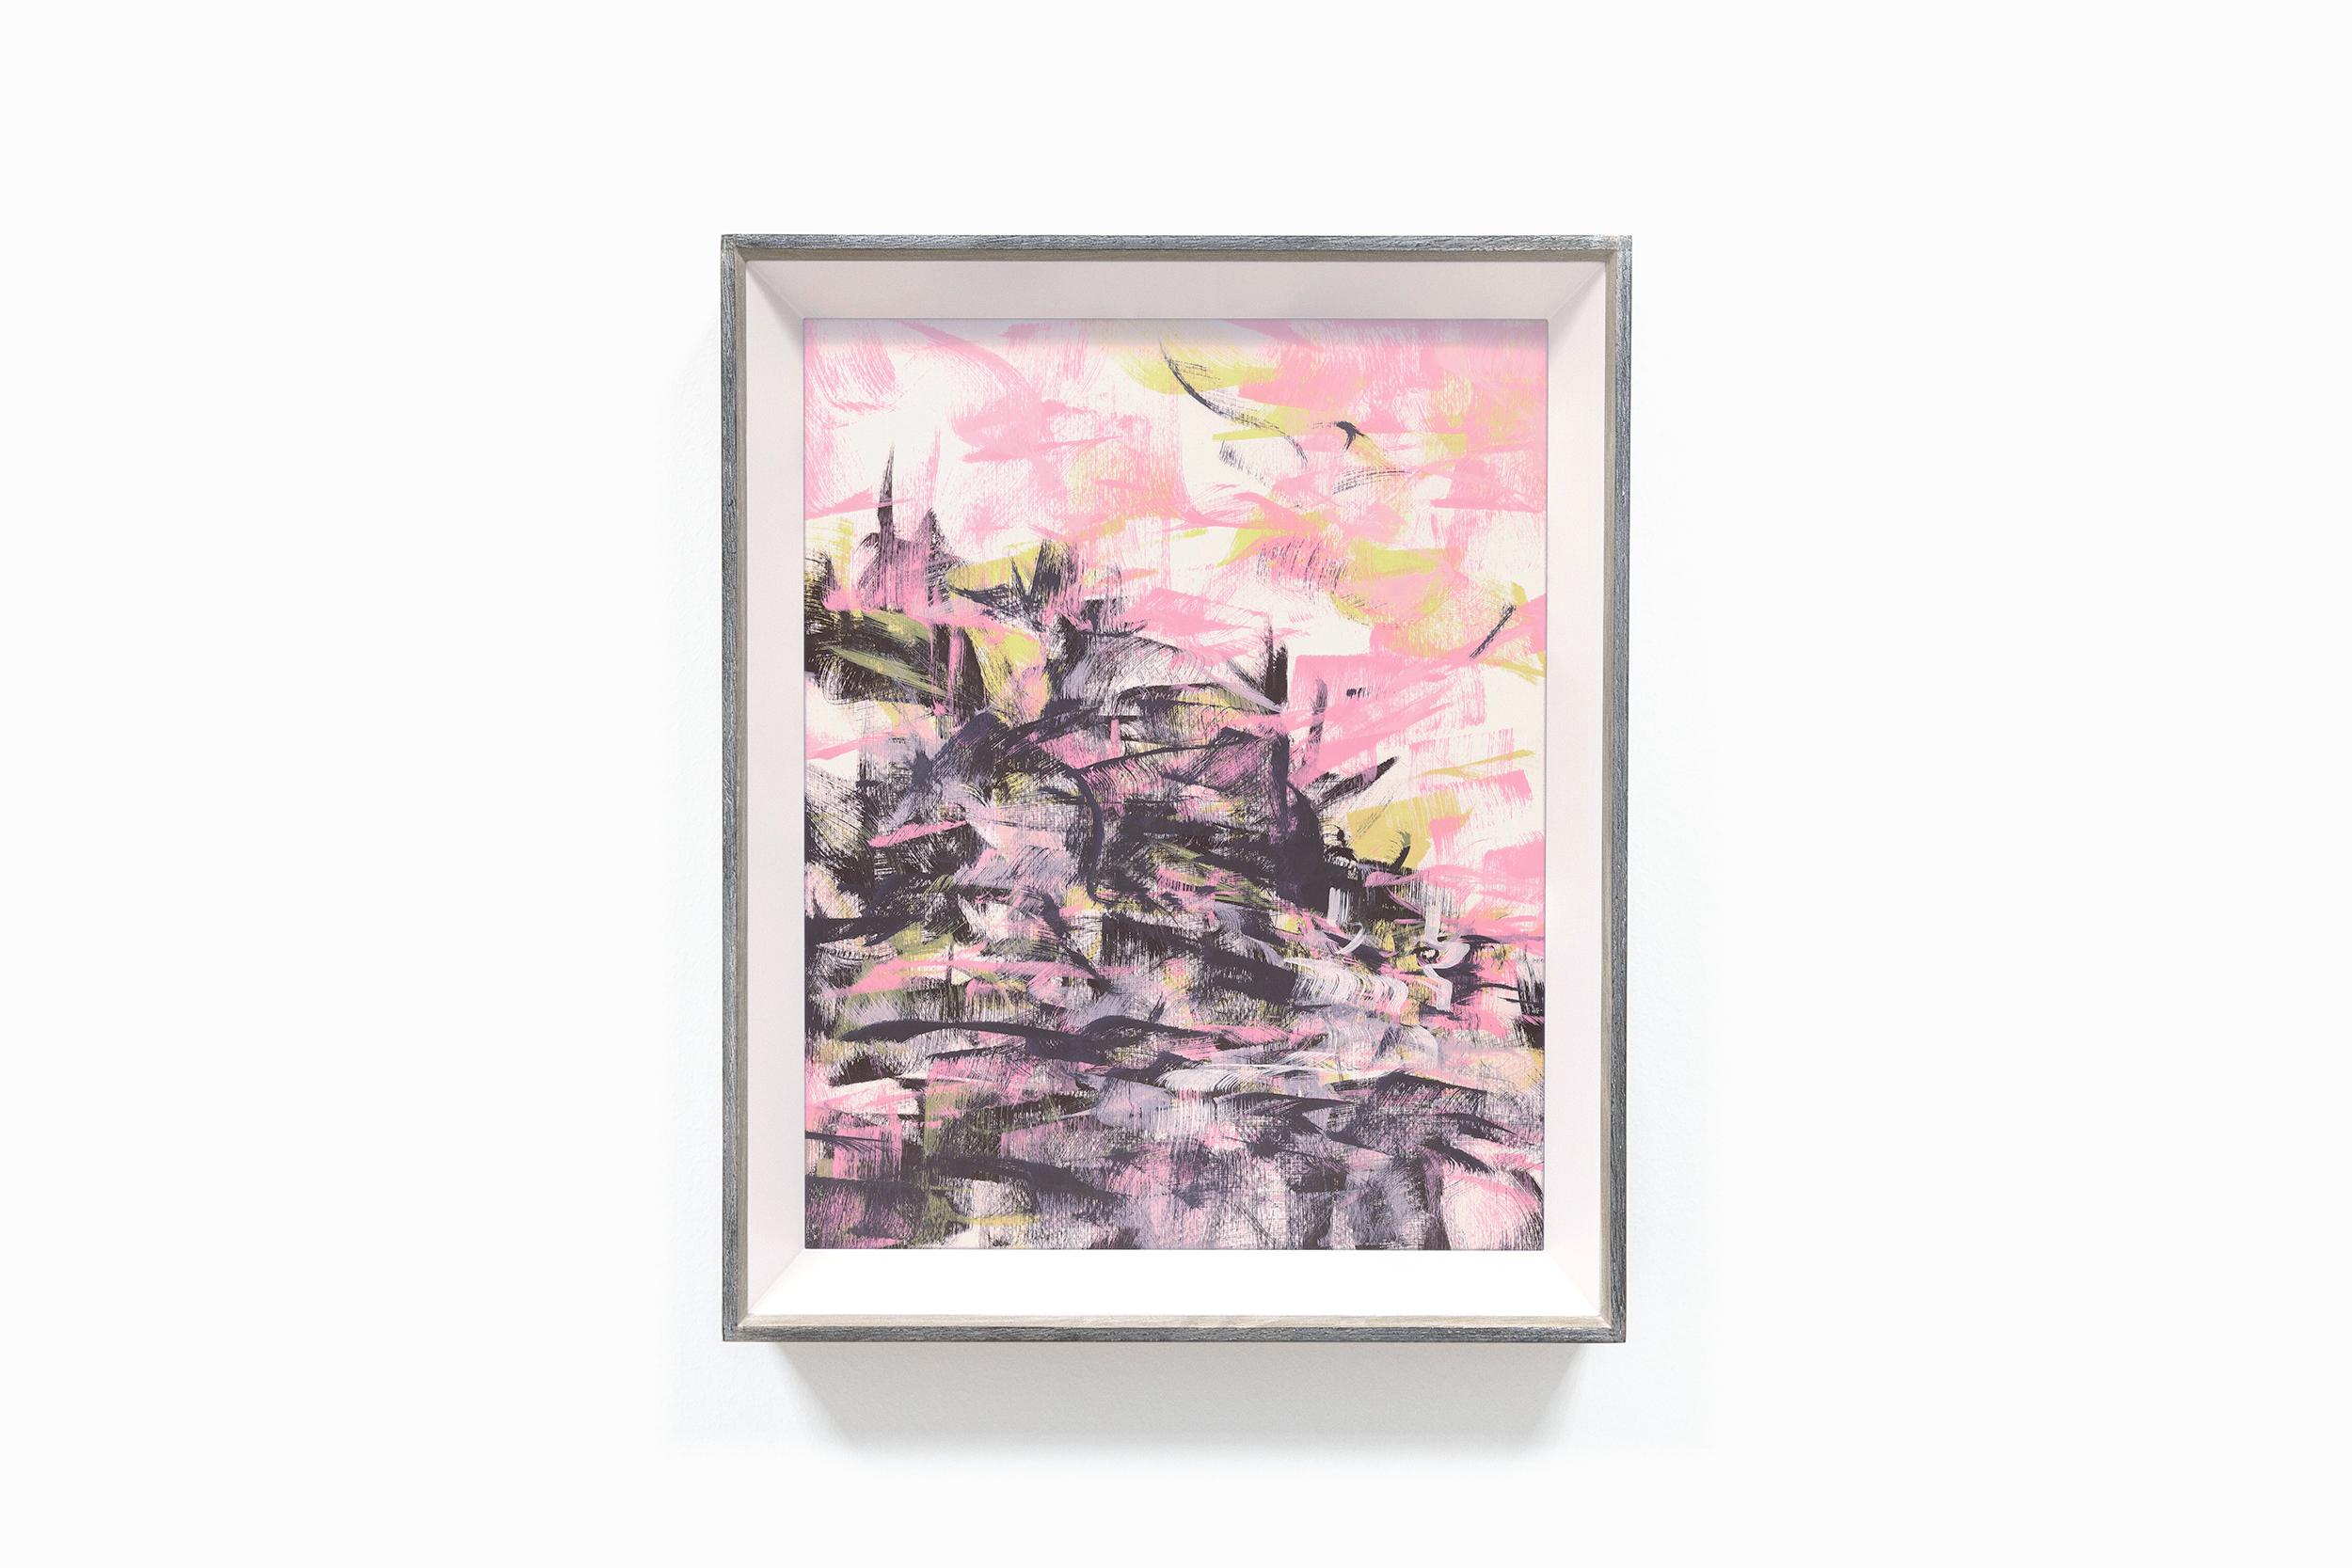 bonjourmolotov+Deambulaia+Exhibition+40x50+Illustration+Ilustracao+painting+pintura+acrylic+acrílico+canvas+tela+paper+cardboard+mdf+Andre+Gigante+21.jpg